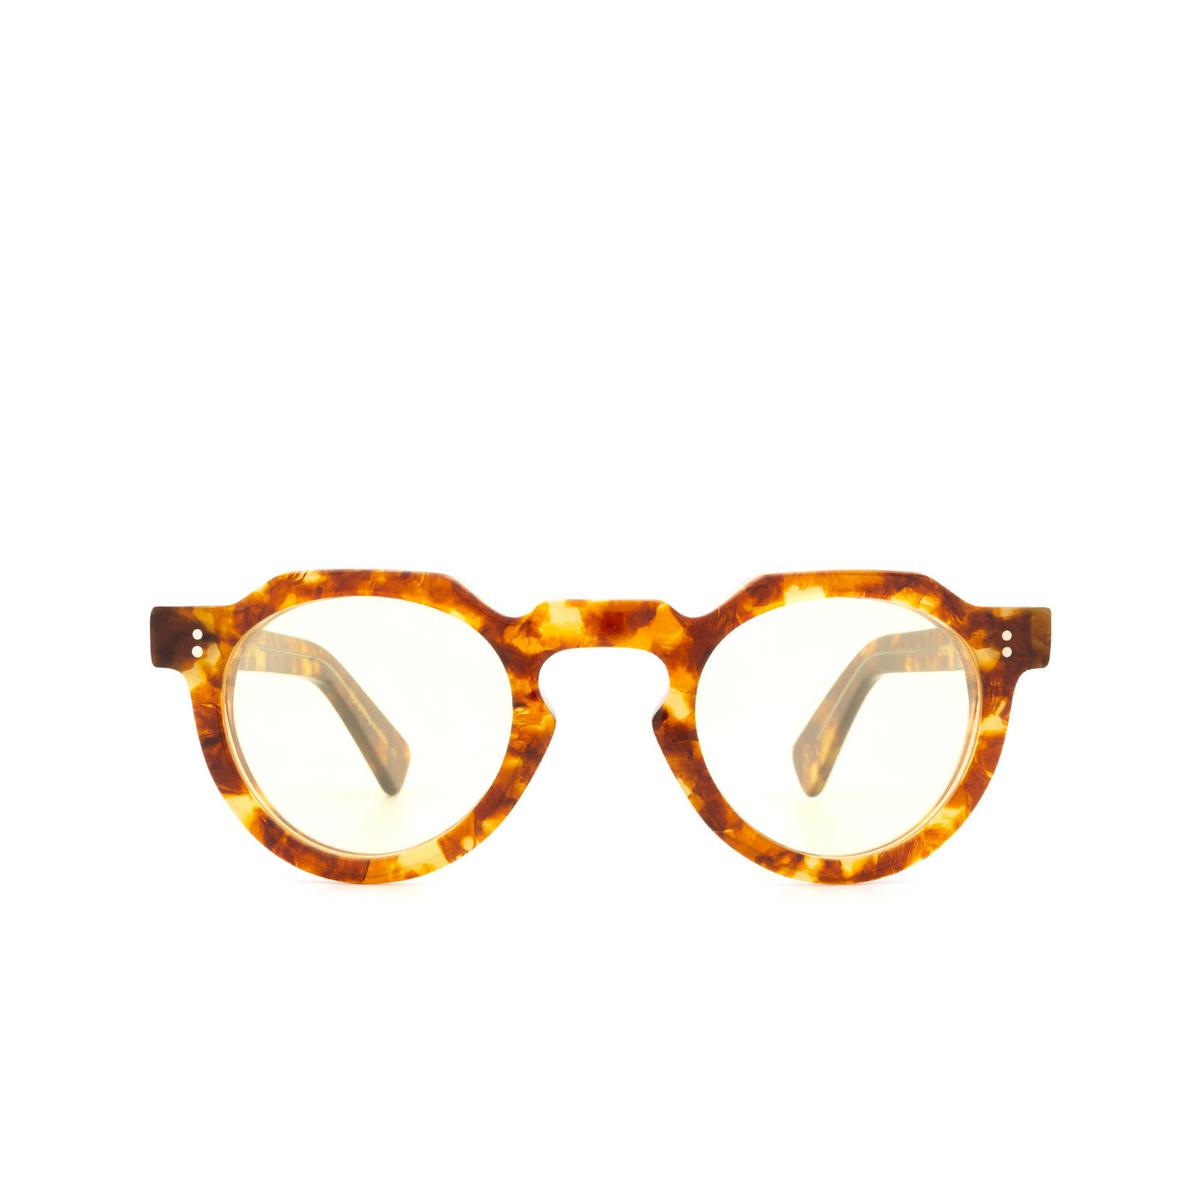 Lesca® Irregular Sunglasses: CROWN PANTO 8MM color Light Havana 9 - front view.